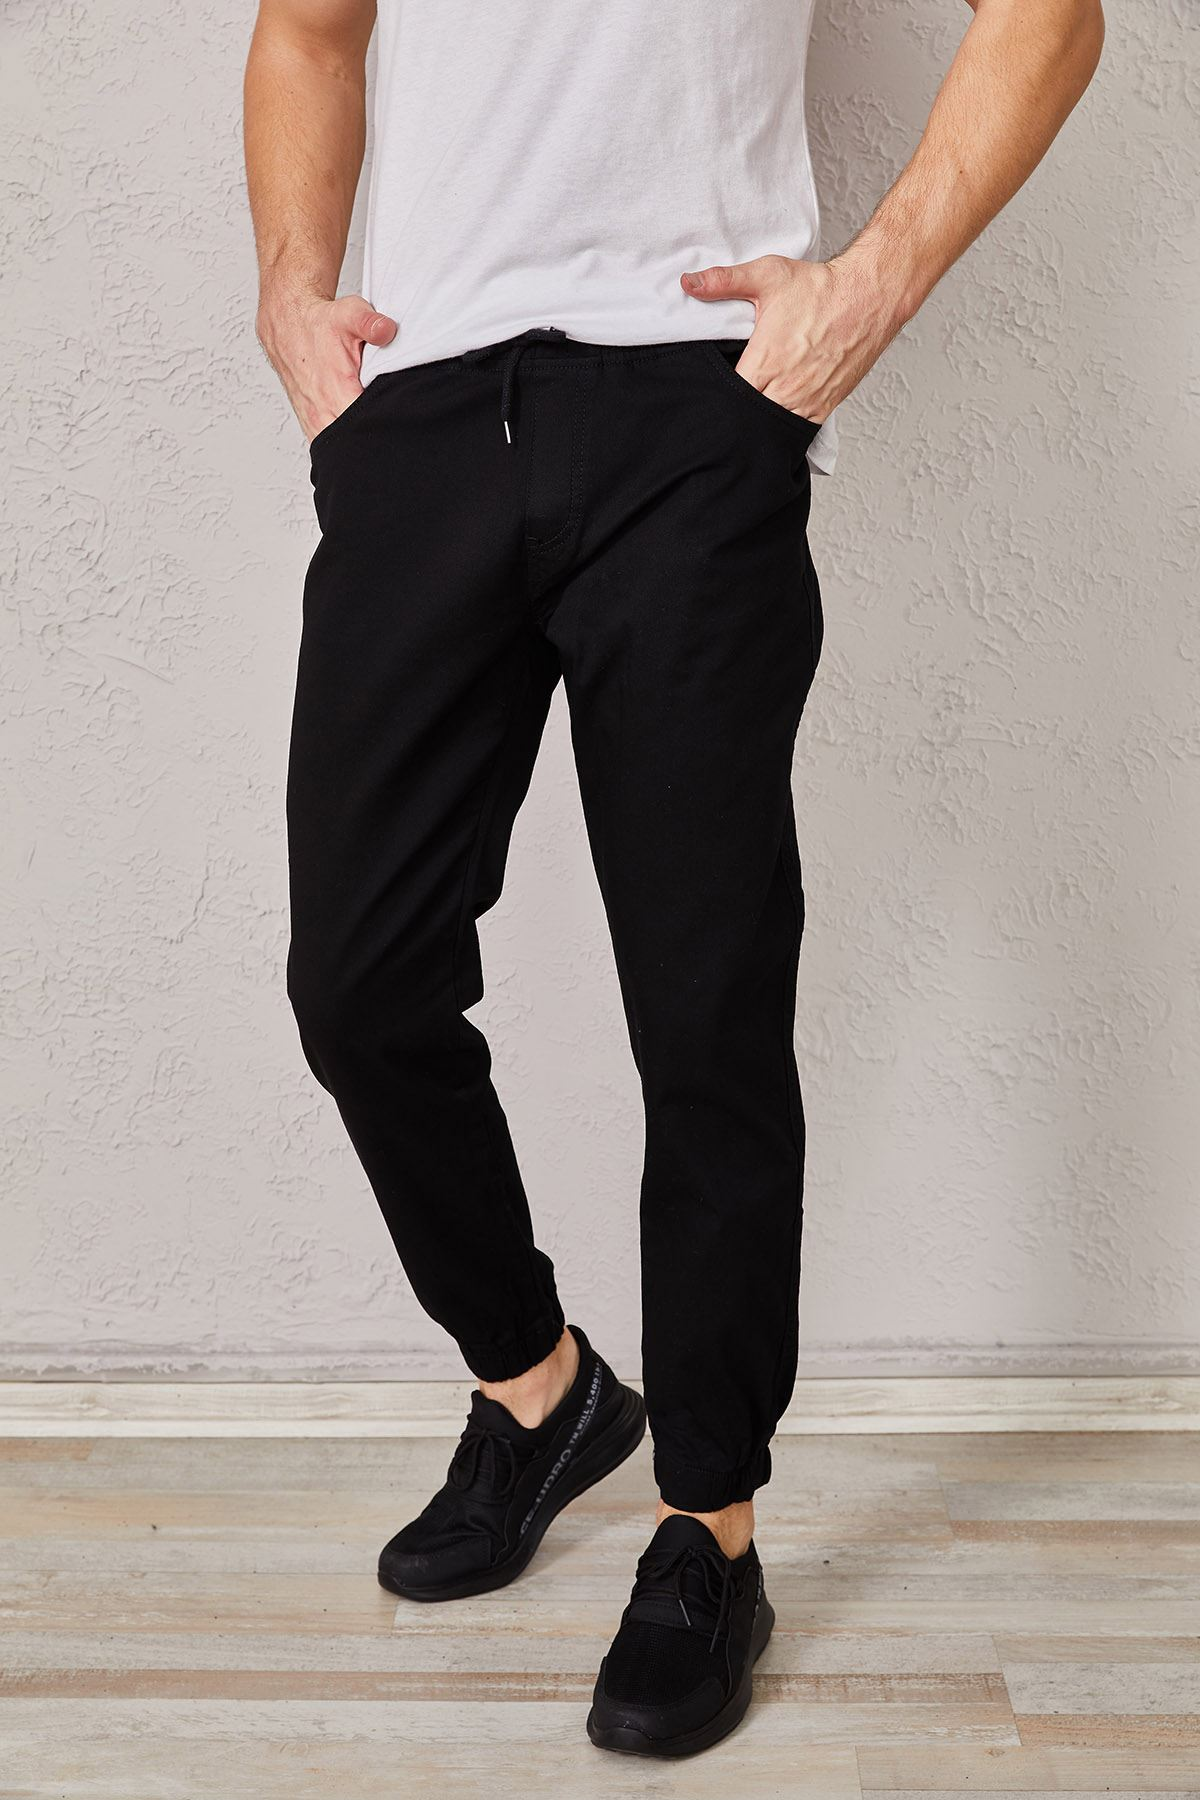 Erkek Bel Ve Paça Lastikli Siyah Pantolon